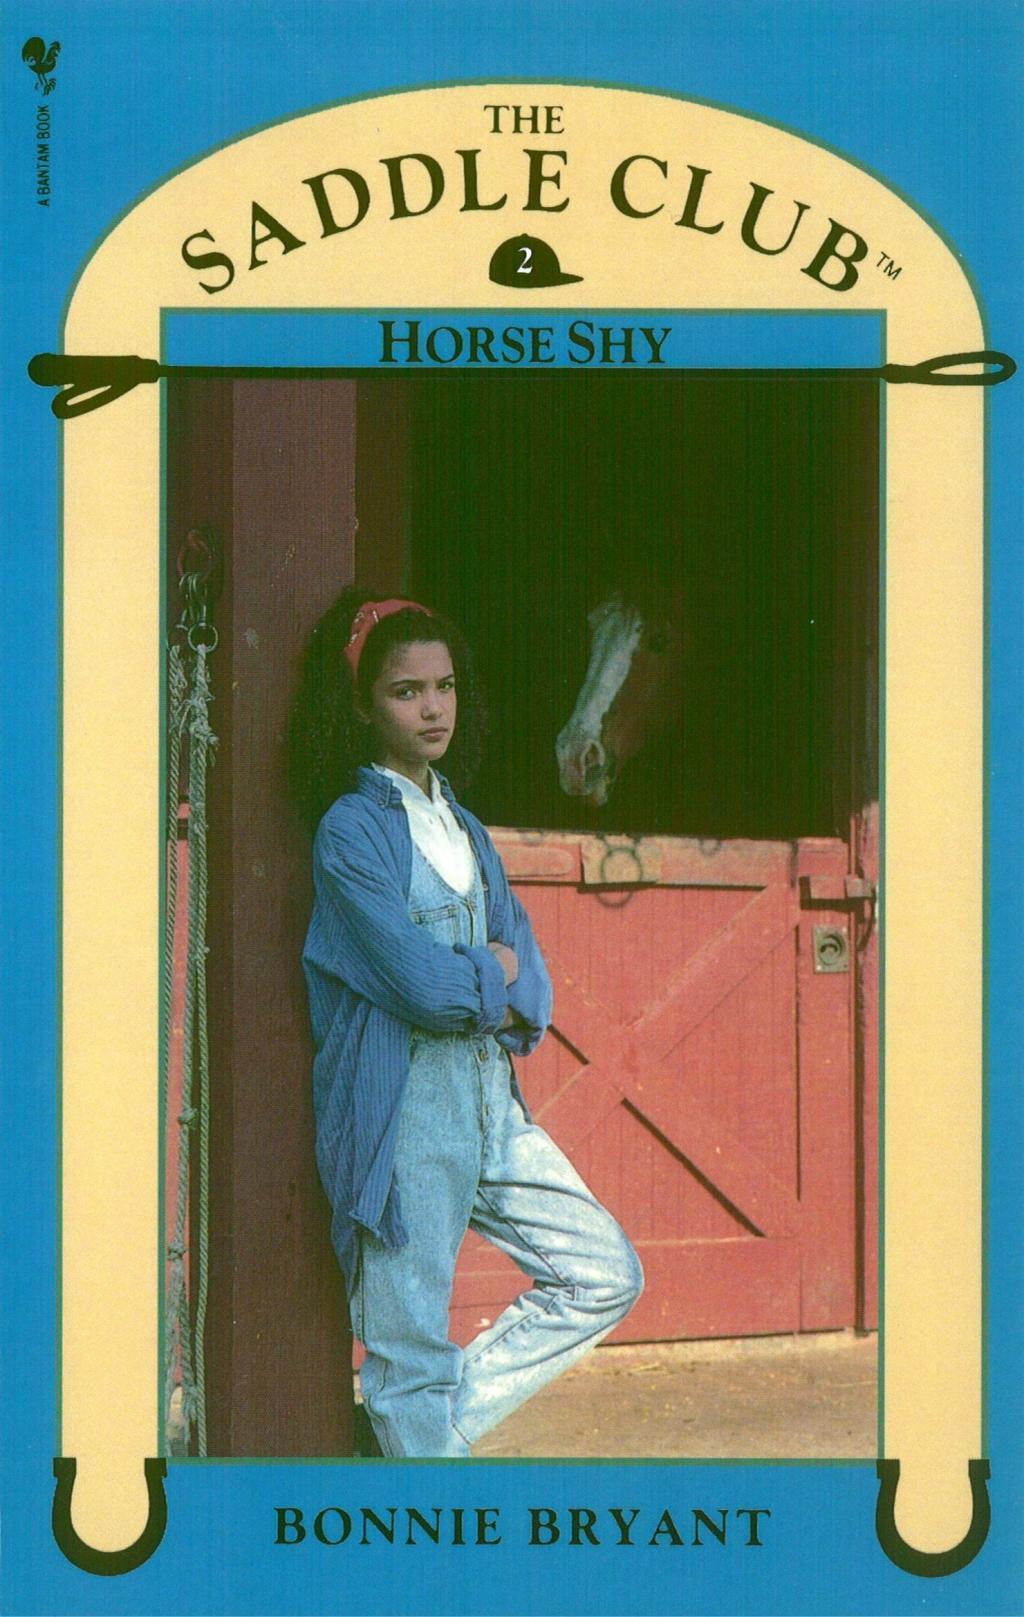 Saddle Club Book 2: Horse Shy